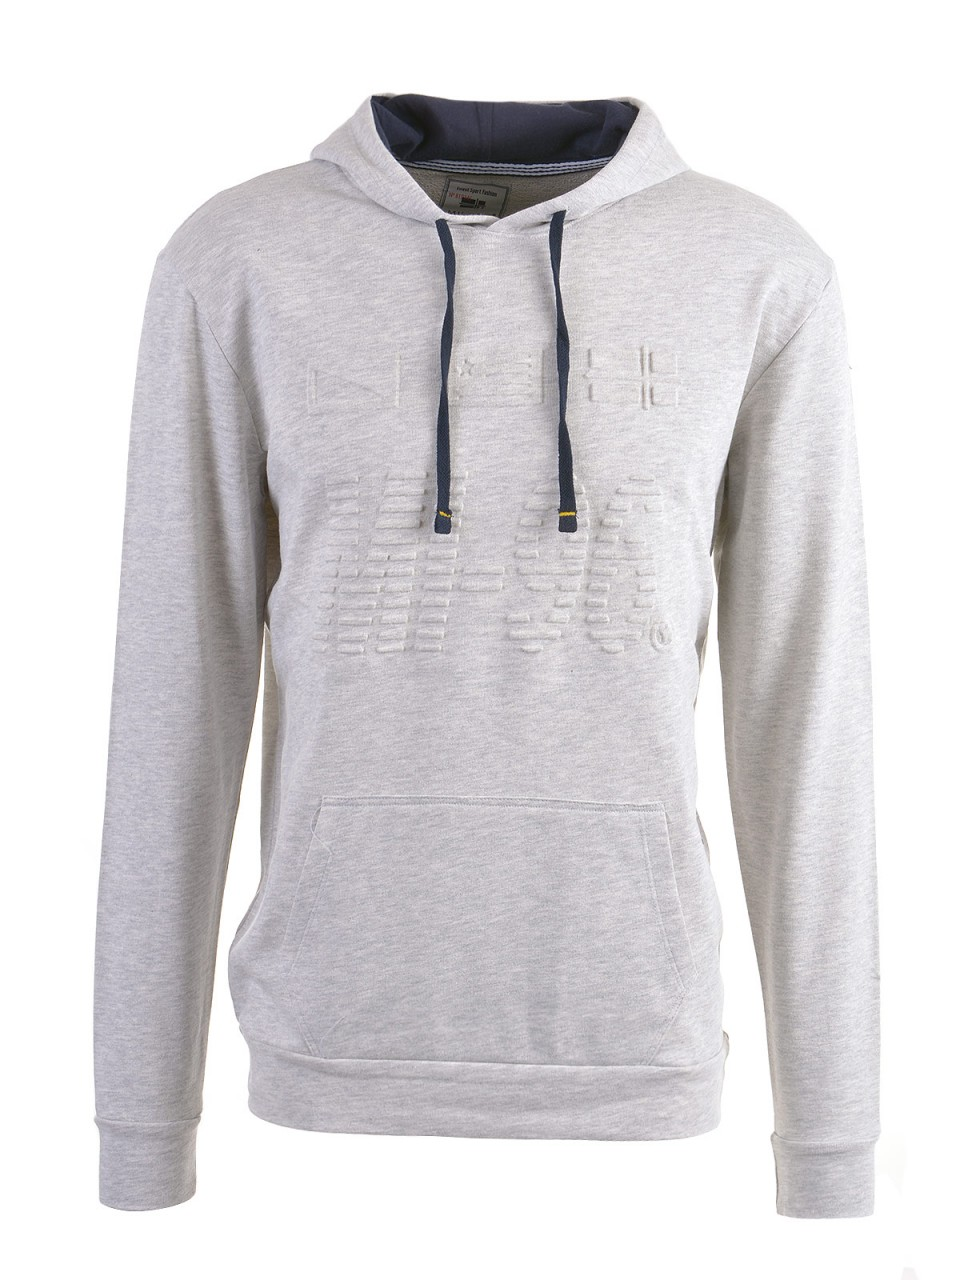 milano-italy-herren-sweatshirt-grau